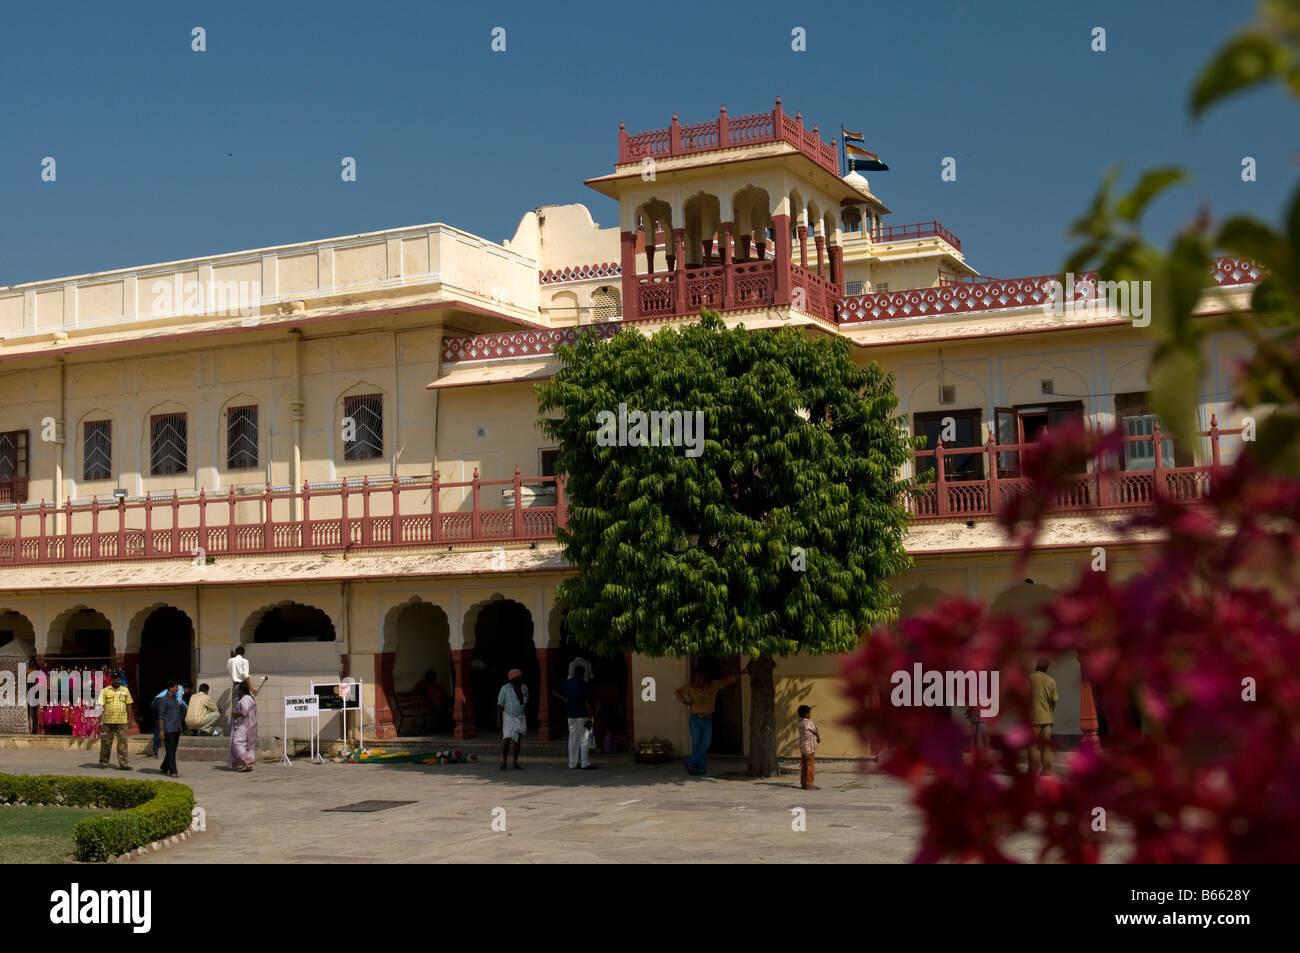 City Palace. Jaipur. Rajasthan. India - Stock Image